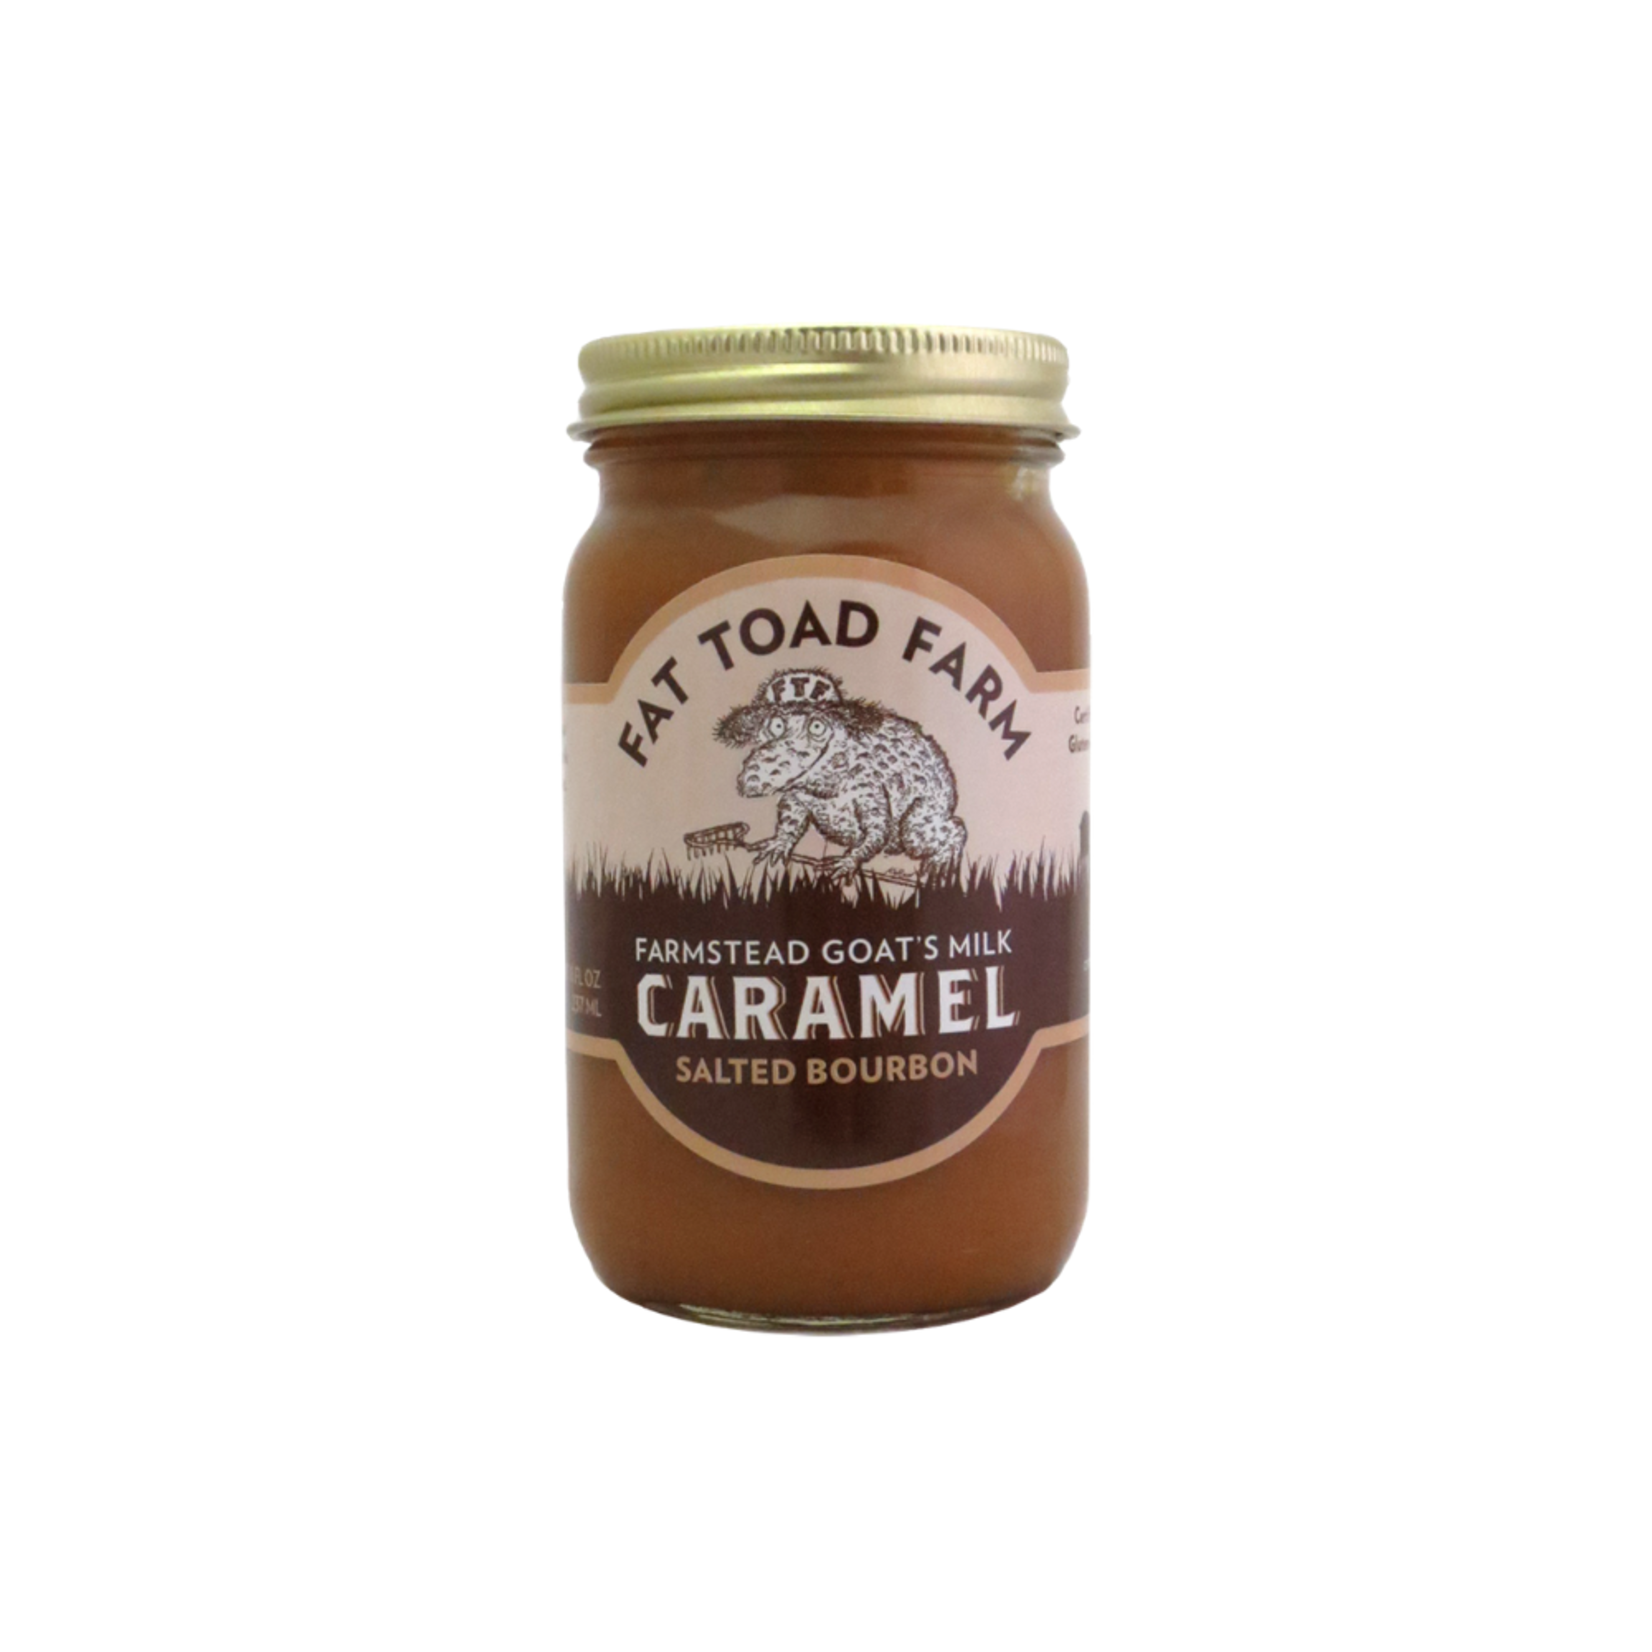 8oz Salted Caramel Bourbon Goat's Milk Caramel